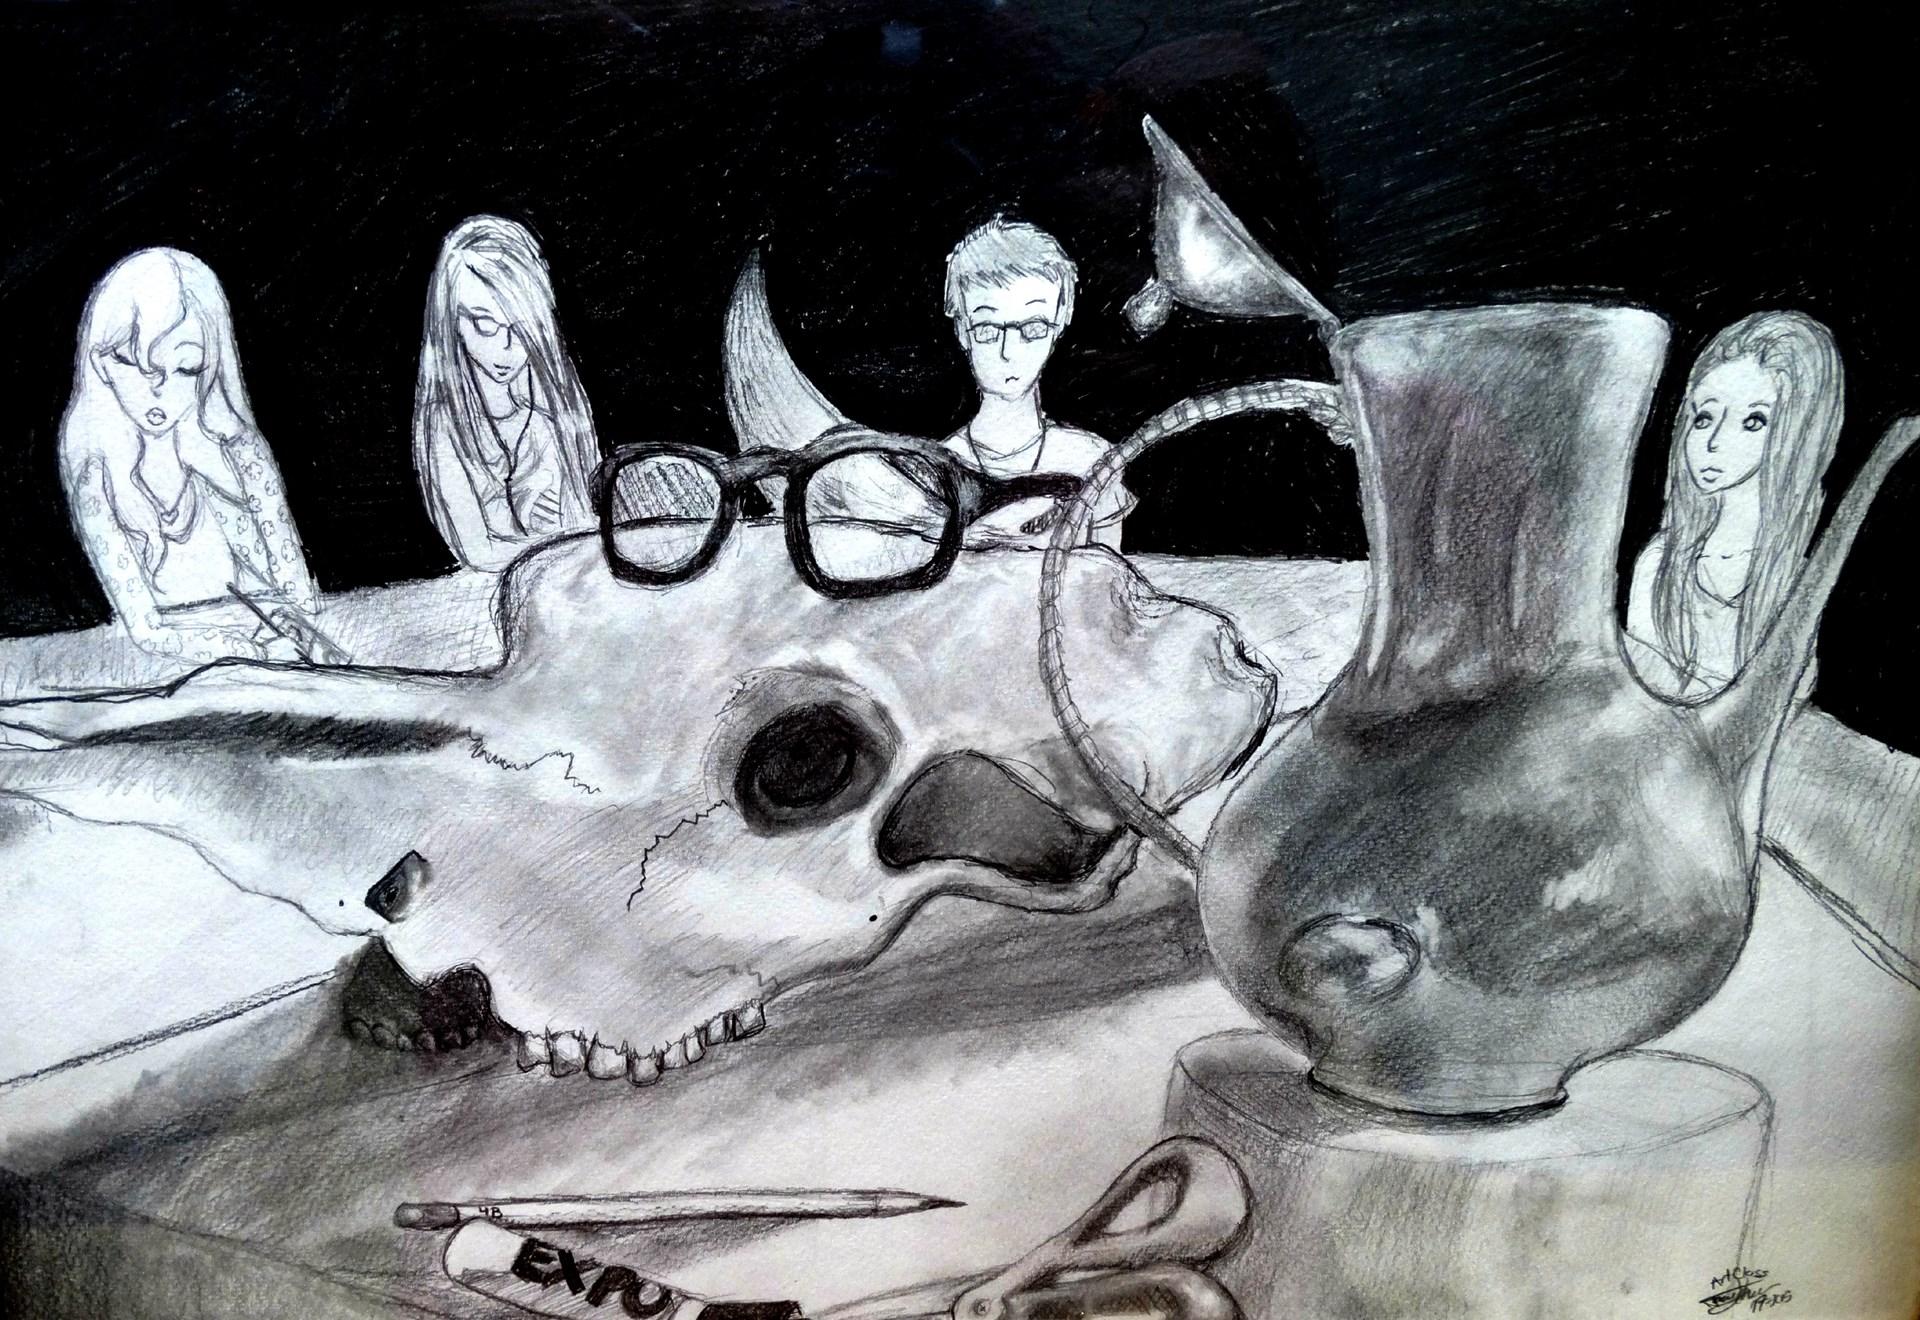 Artist: Tamara Lehew, Grade 11 at McGuffey HS